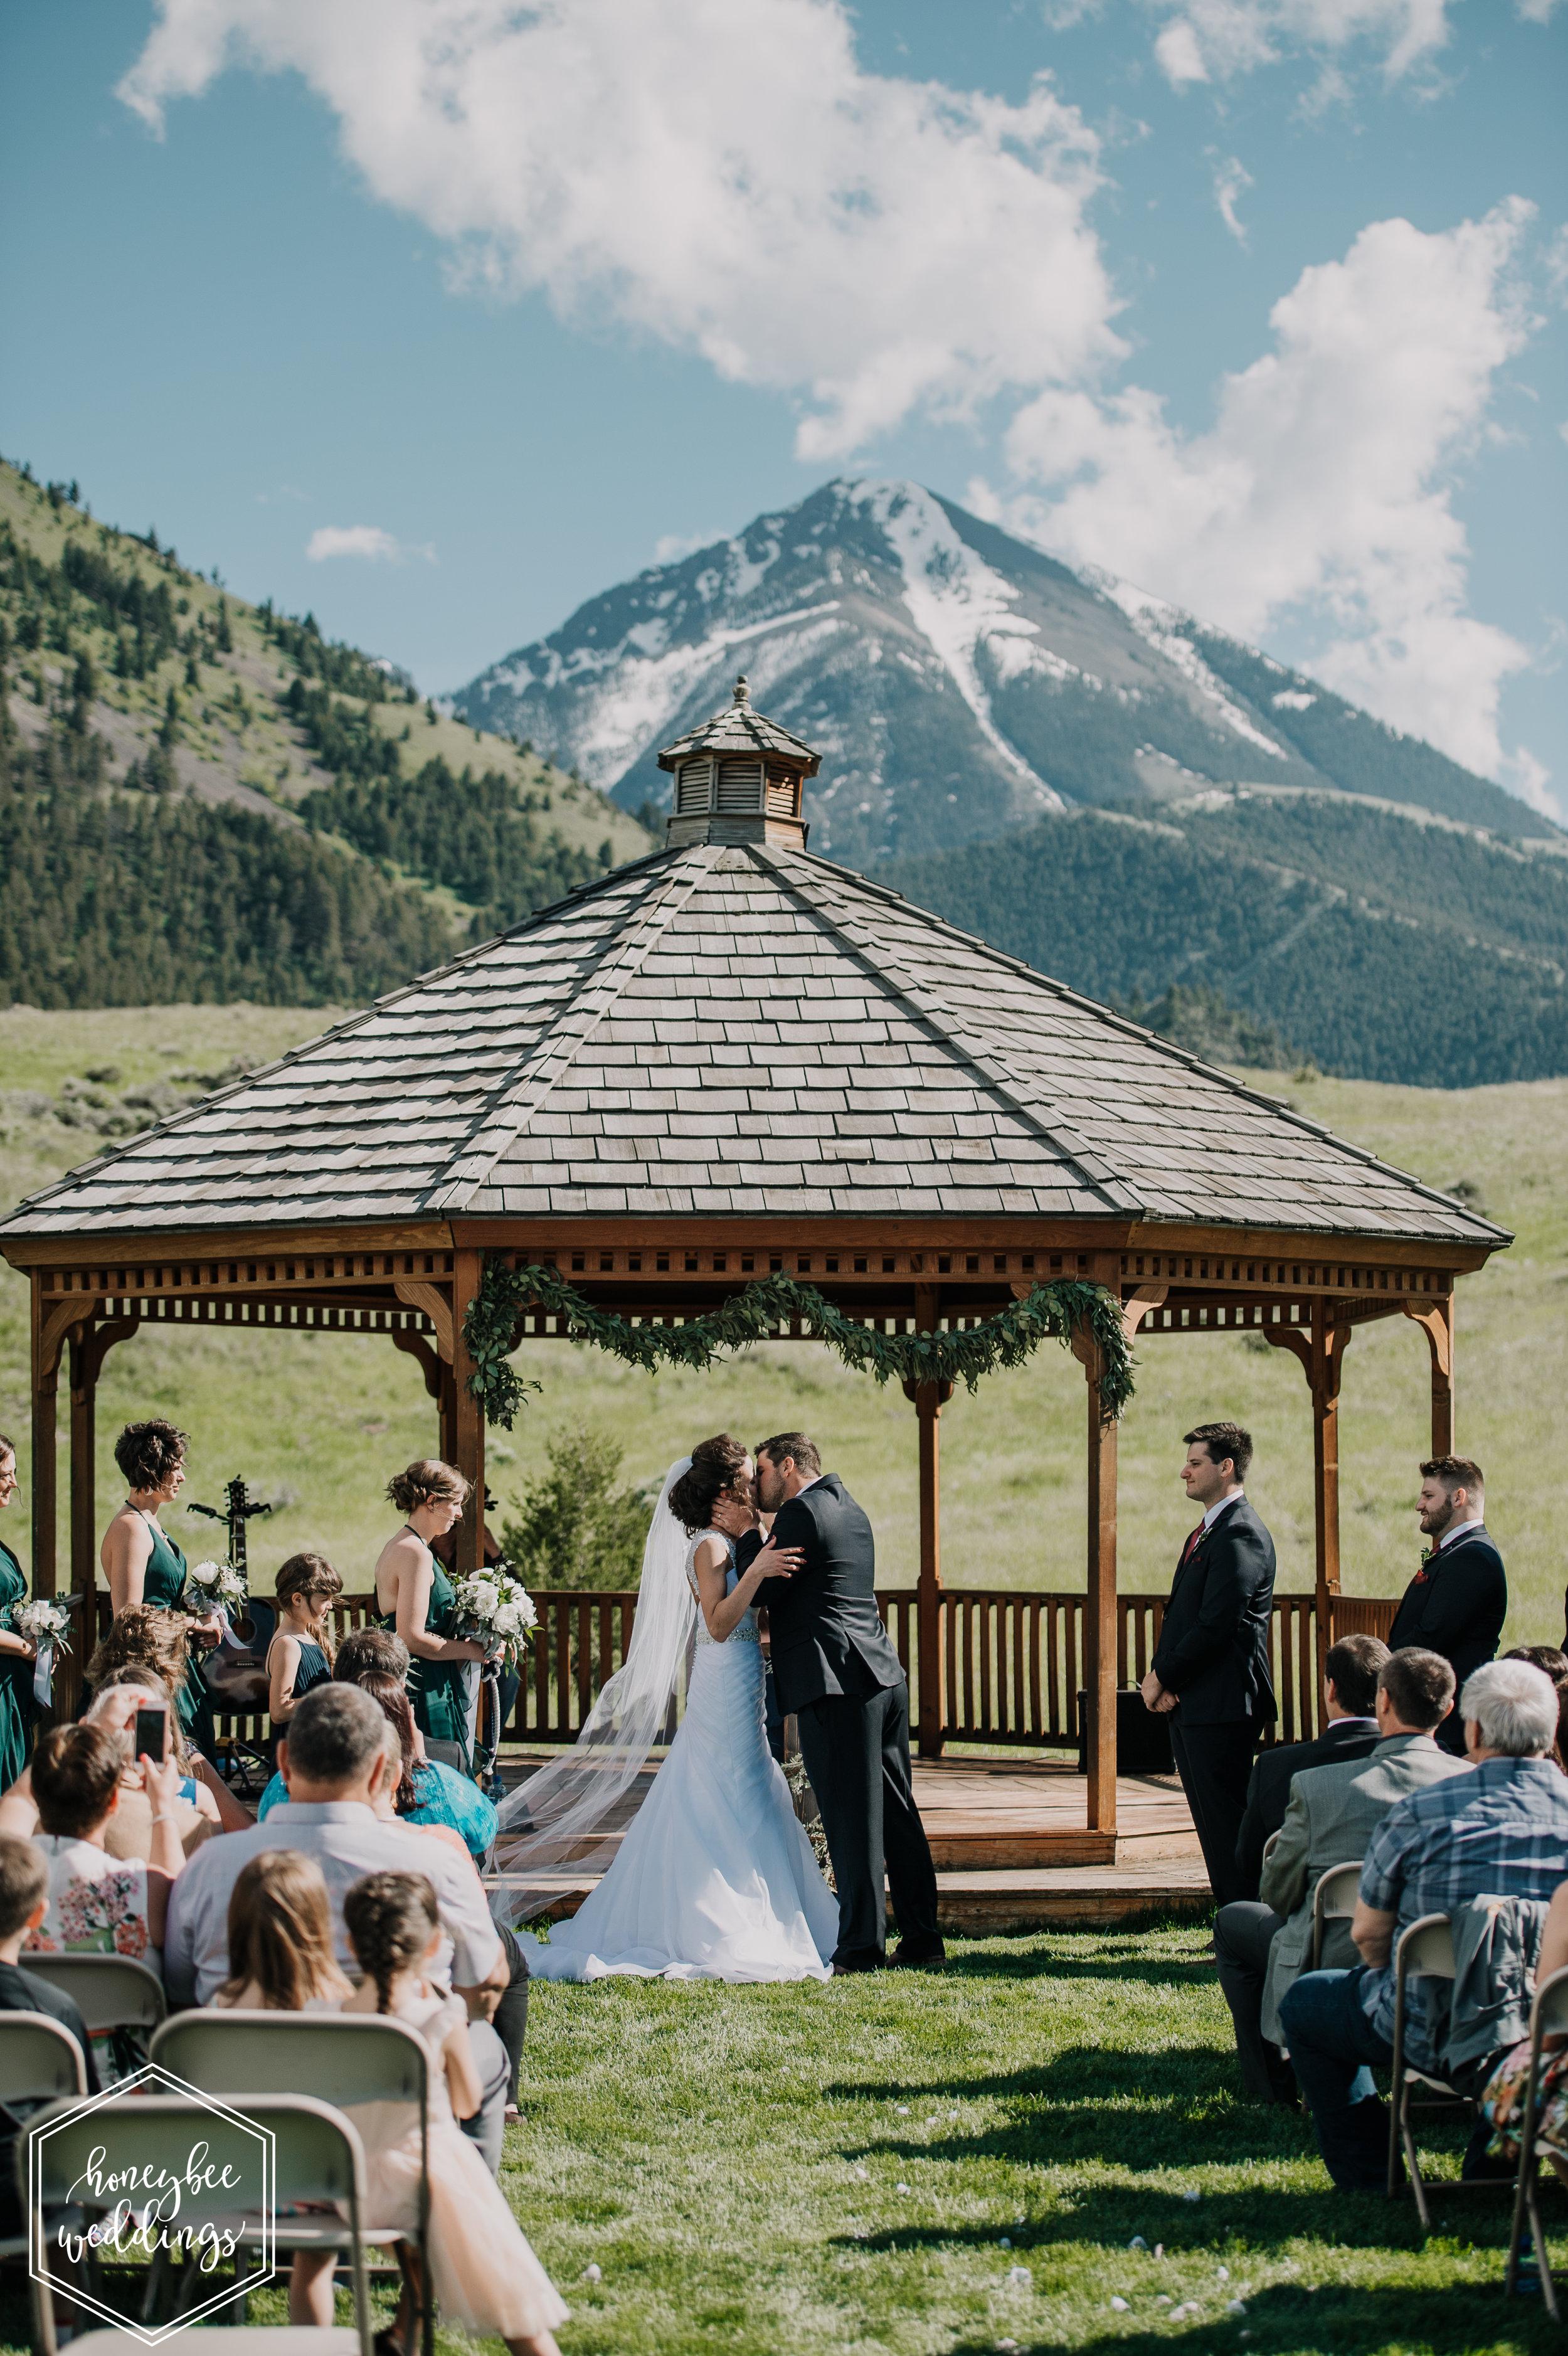 109 Chico Hotsprings Wedding_Bowdino 2018-3605-2.jpg